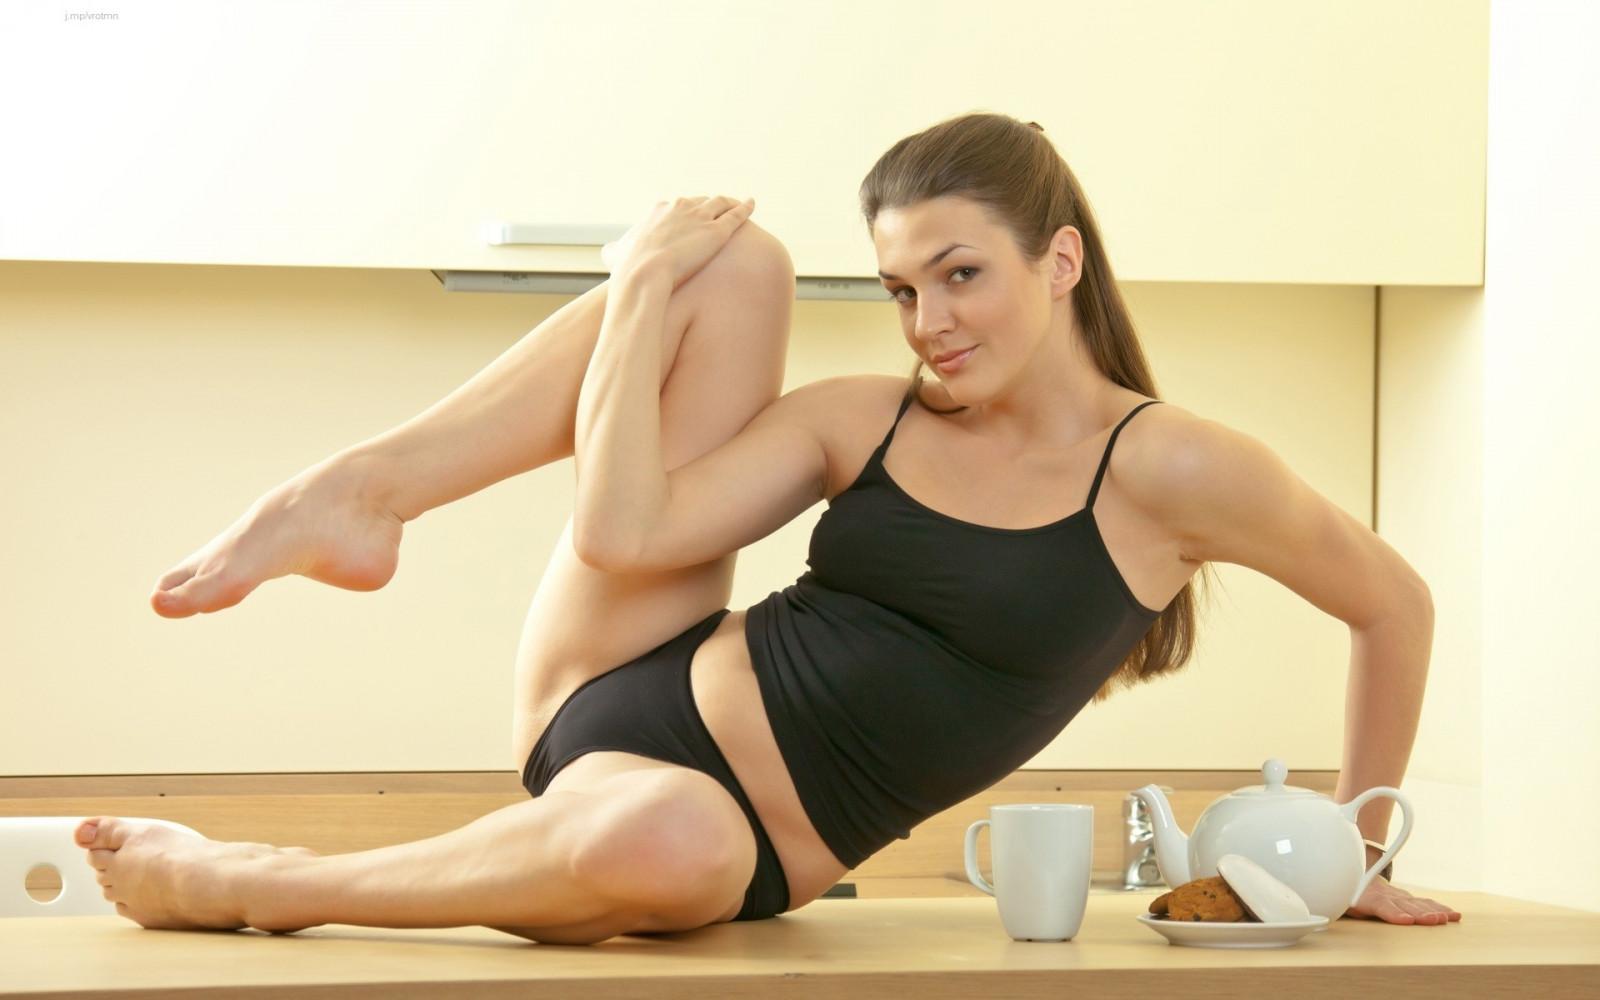 спортивная девушка раздвигает ноги девушка